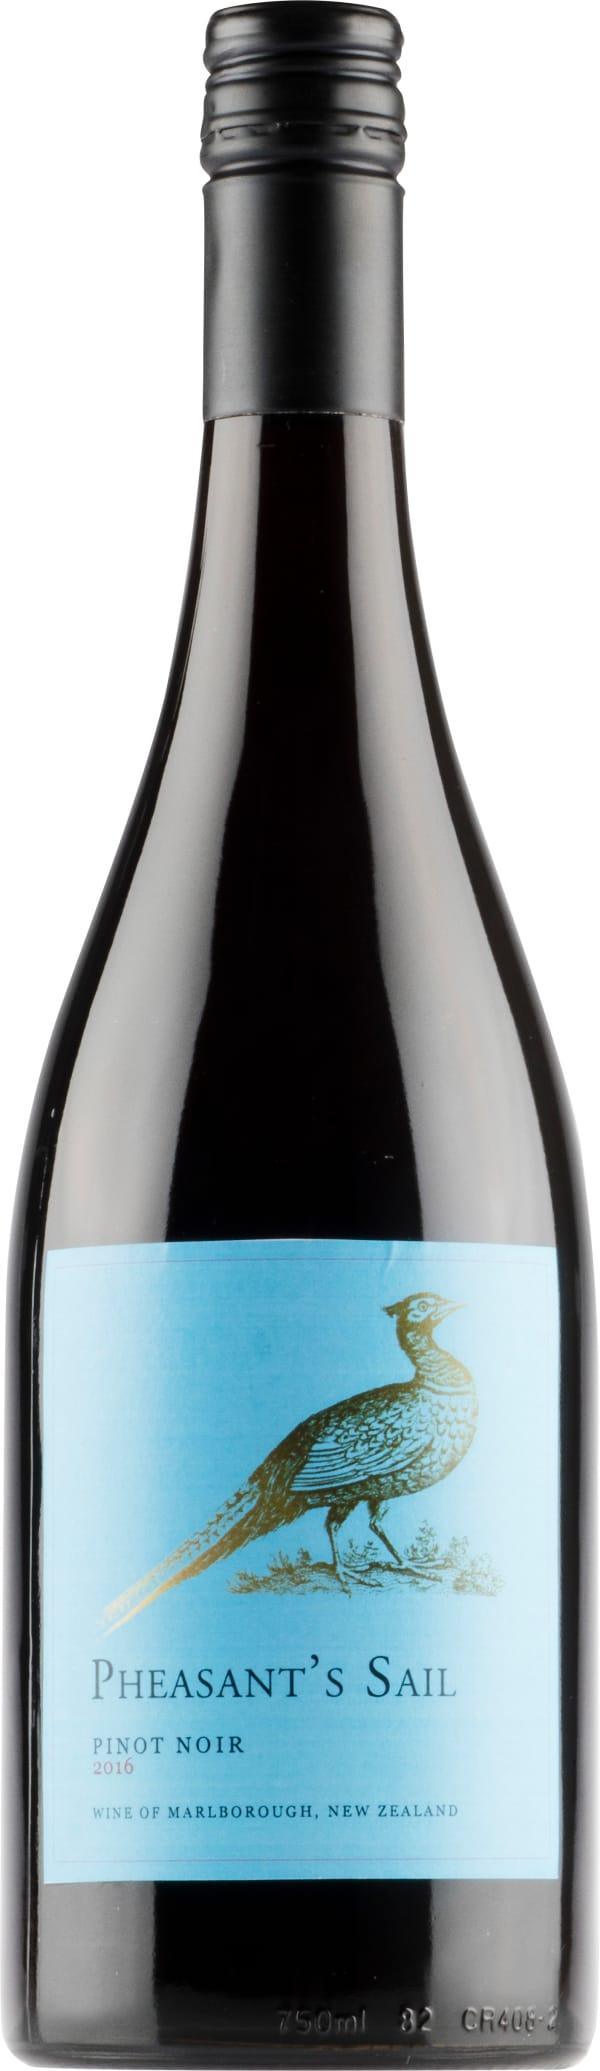 Pheasant's Sail Pinot Noir 2020